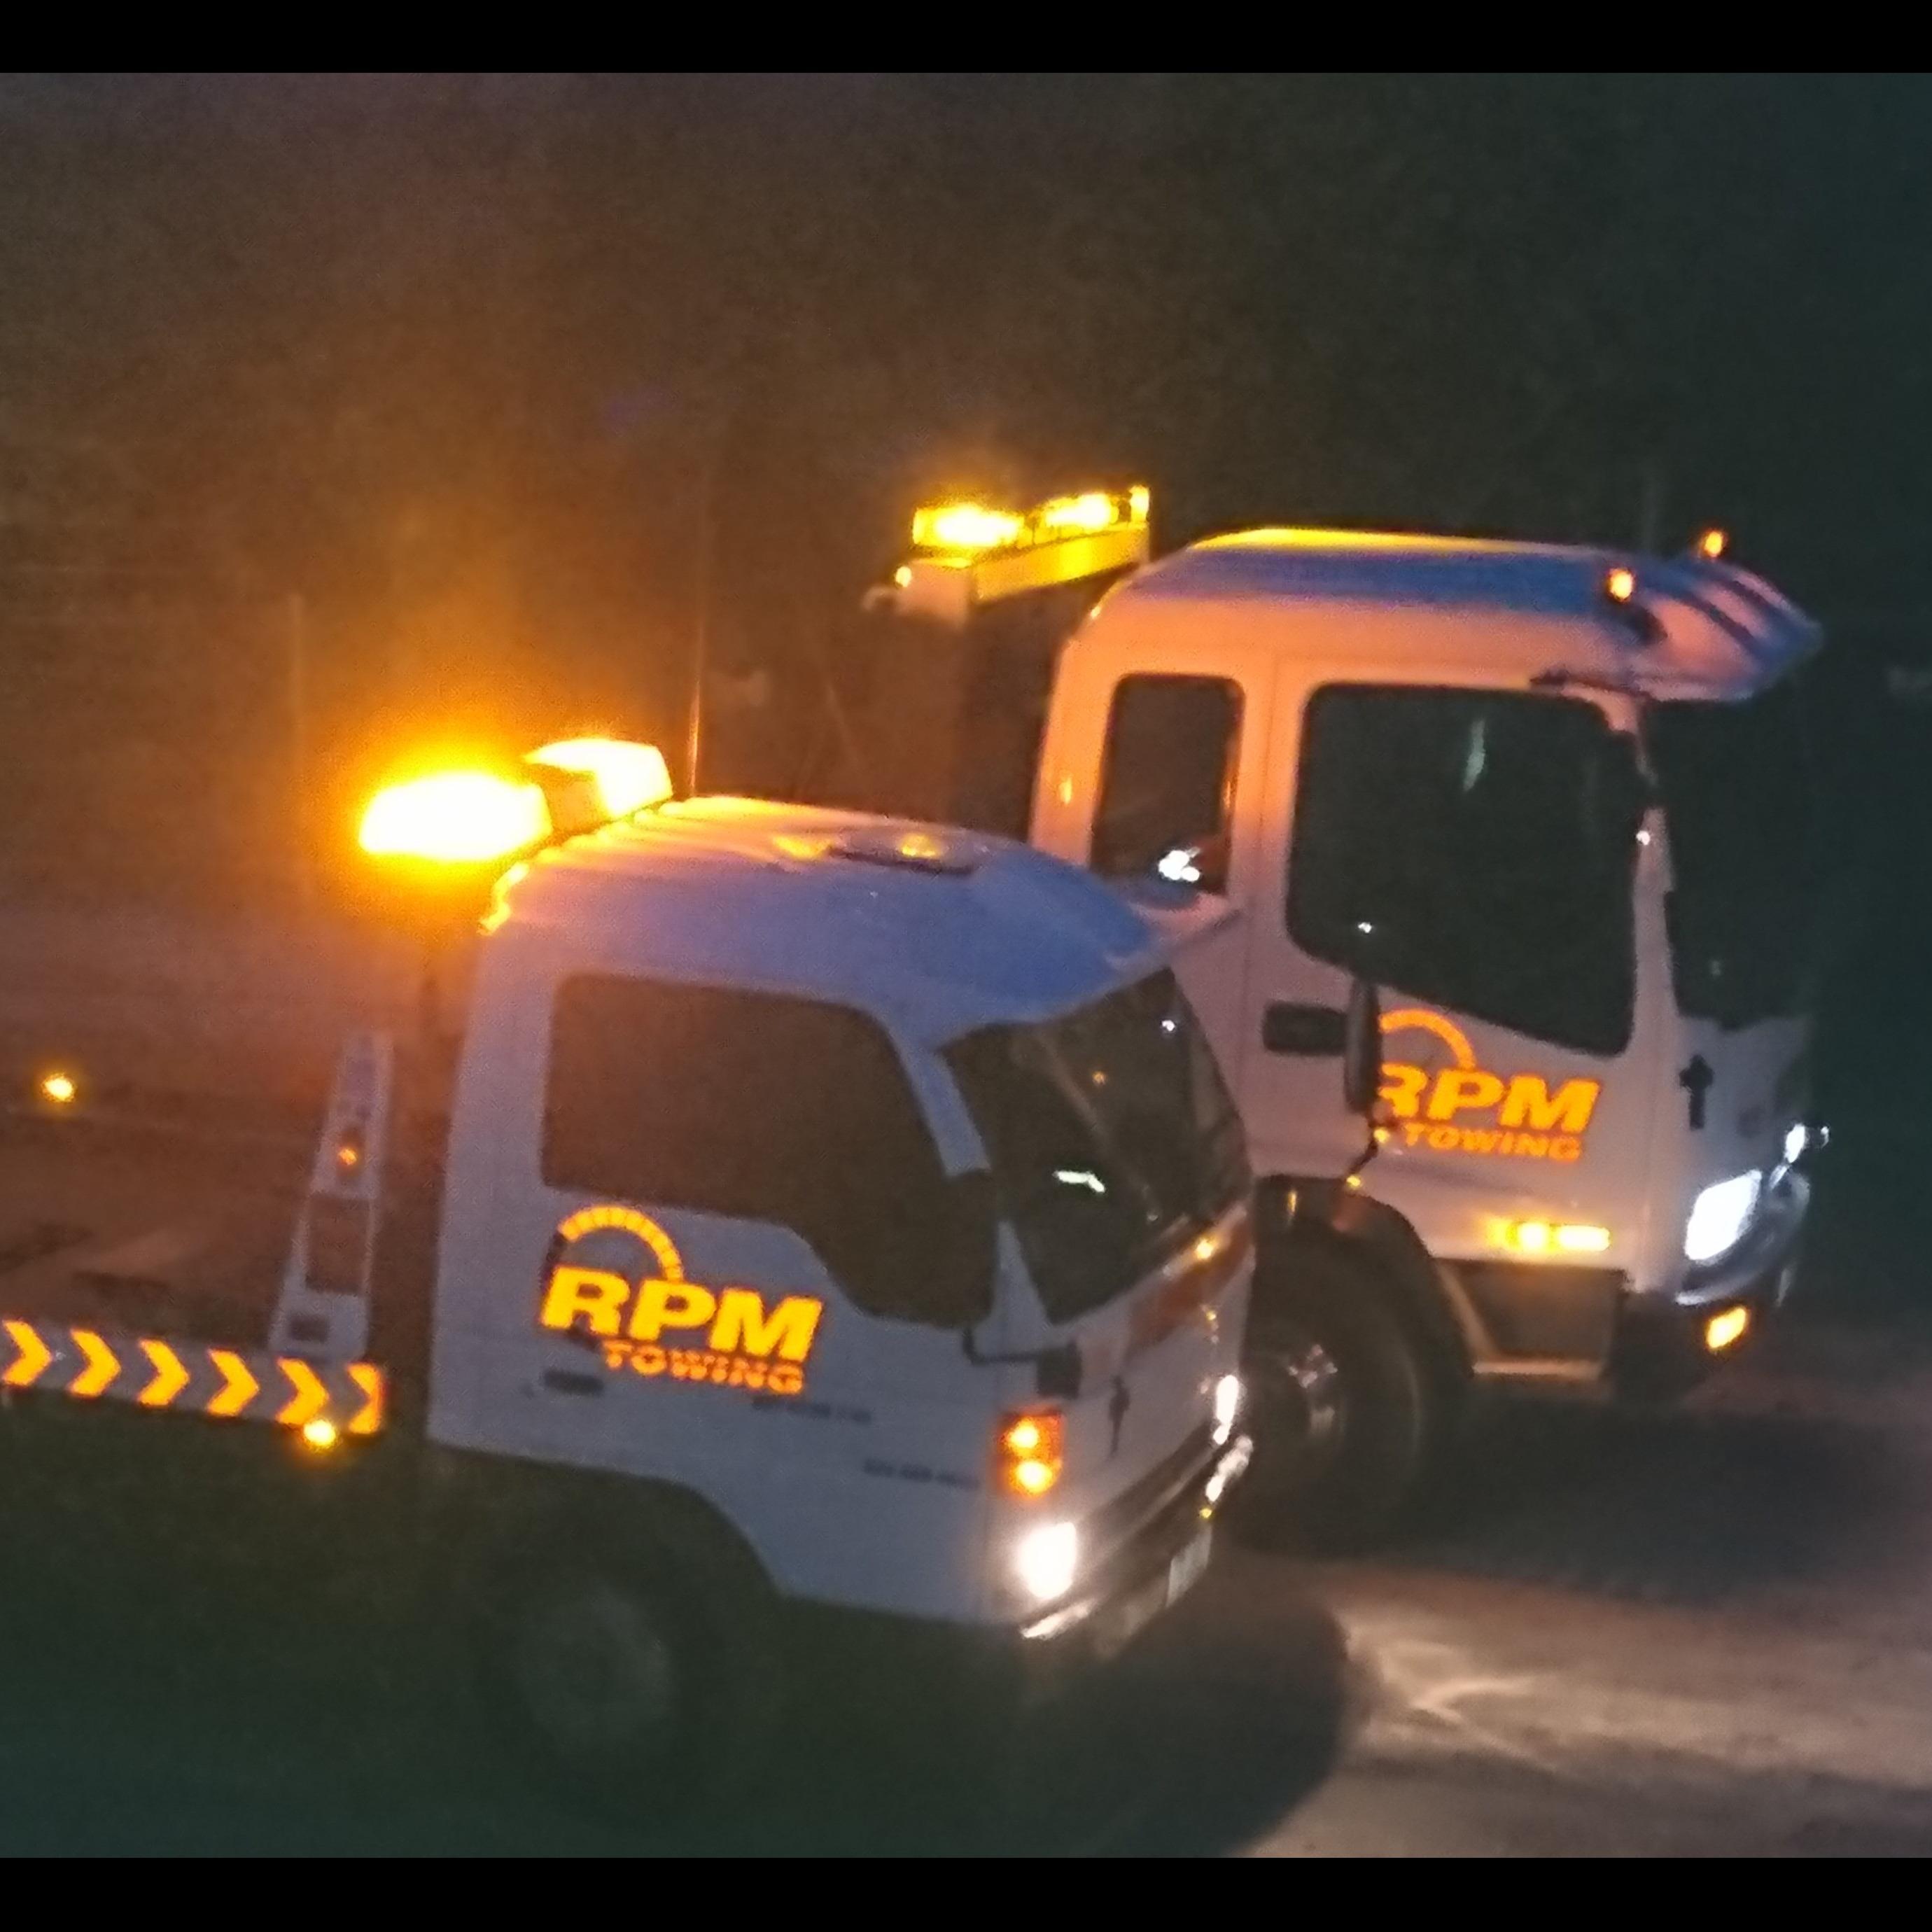 RPM Towing Ltd